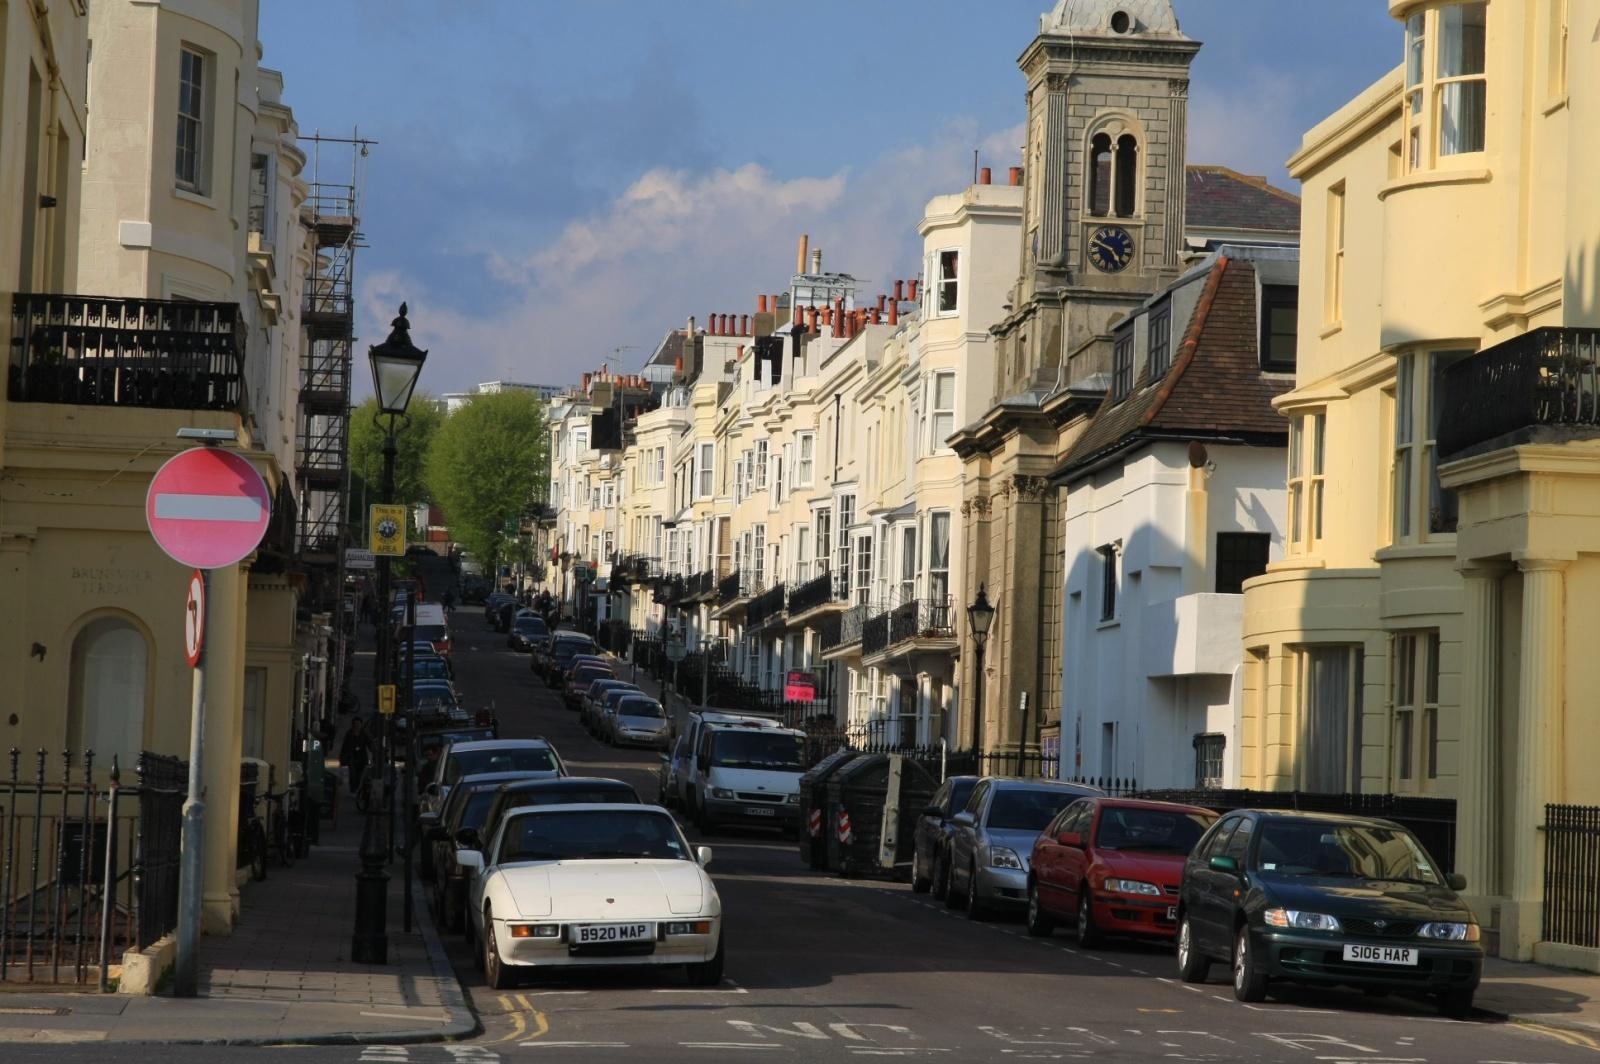 Brighton, the English summer capital